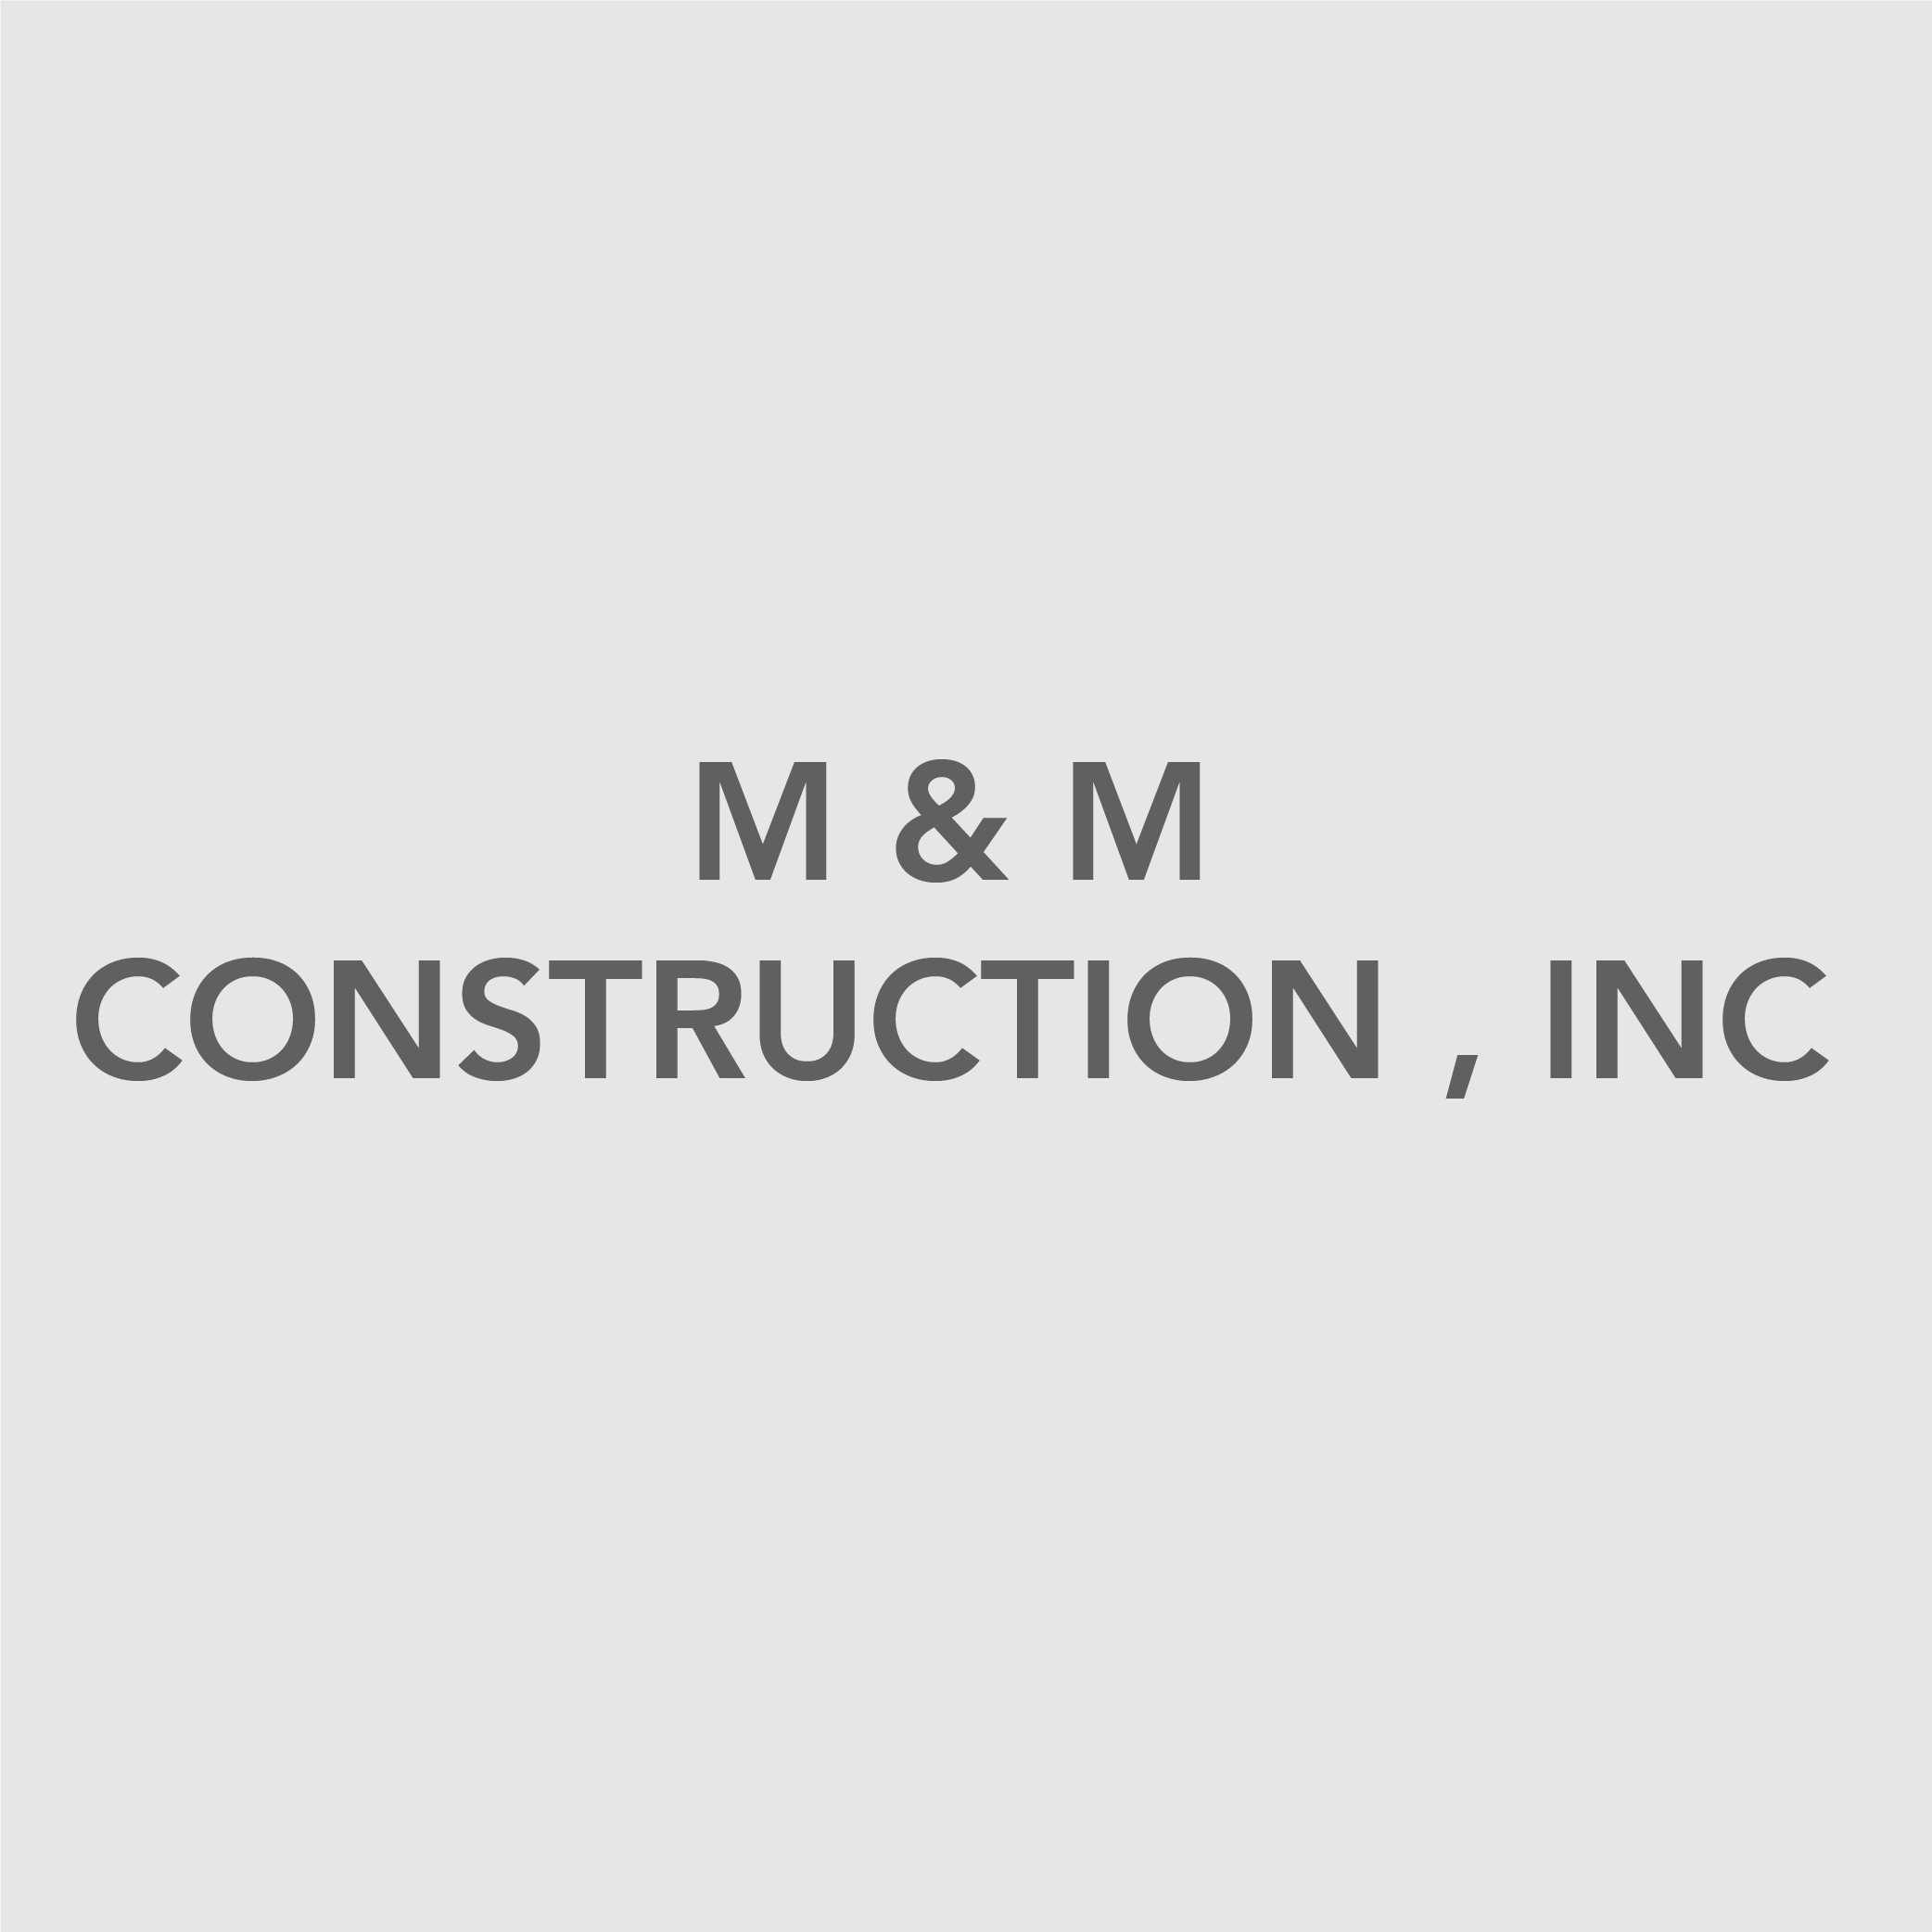 M&M Construction    Mark Maness    28 Clara Ave.    Webster Groves, MO 63119    (314) 968-0924    markatmandm@sbcglobal.net    Member Since: 2014